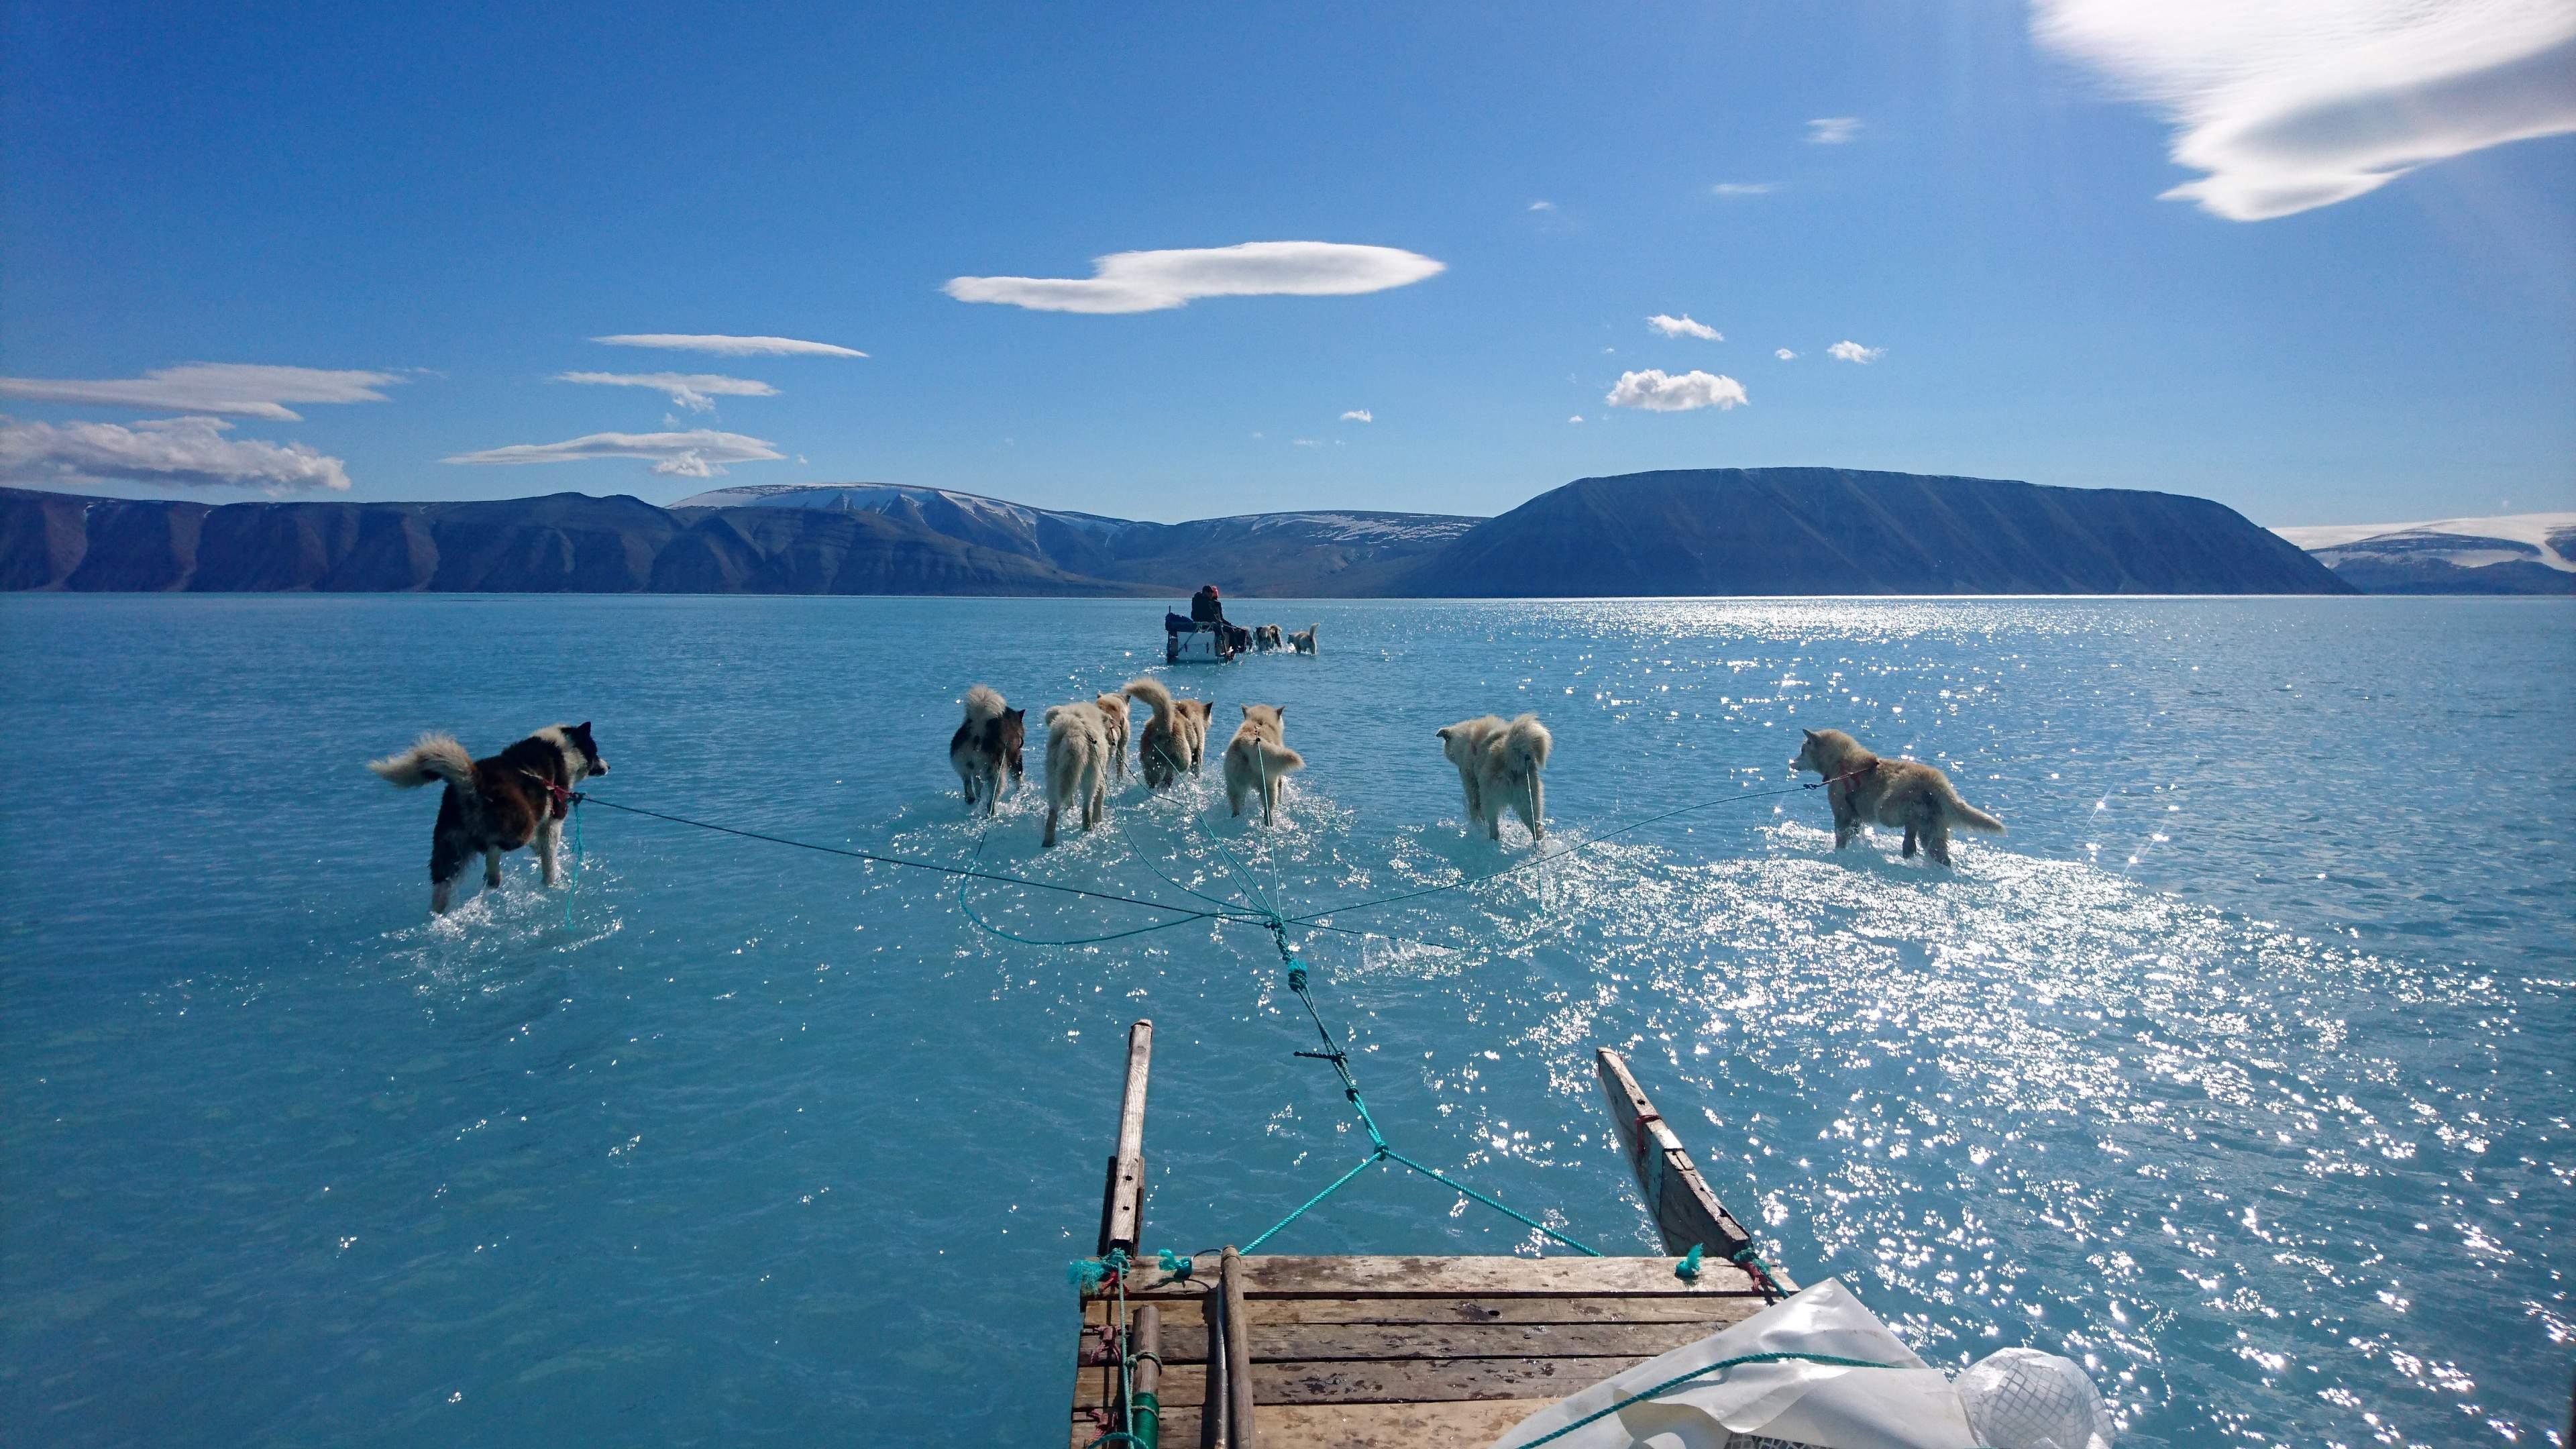 Greenland, June 2019